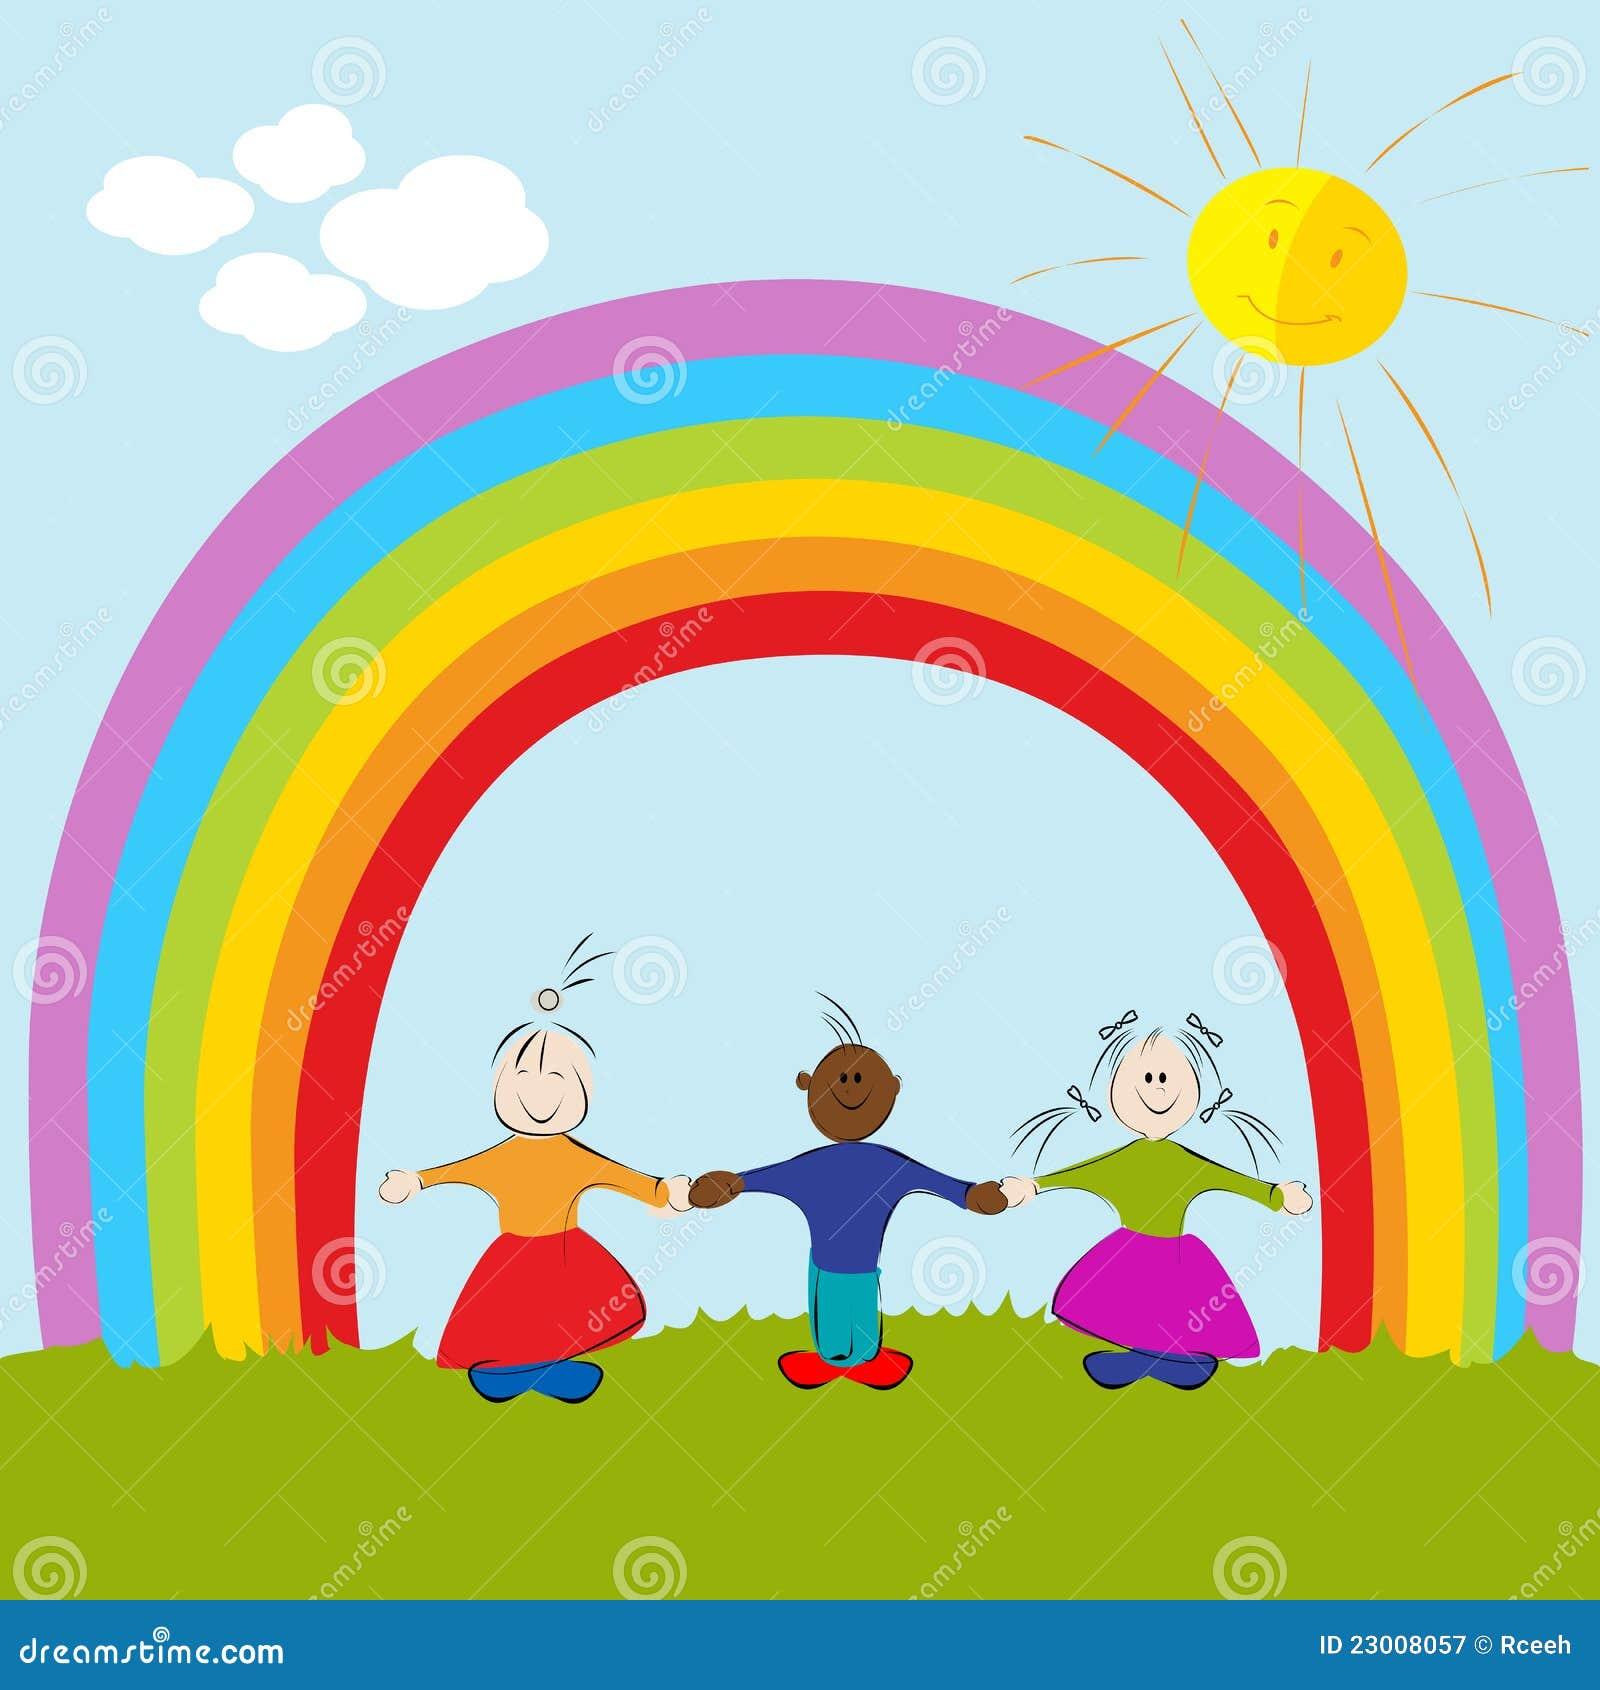 rainbow color wallpaper kids - photo #36